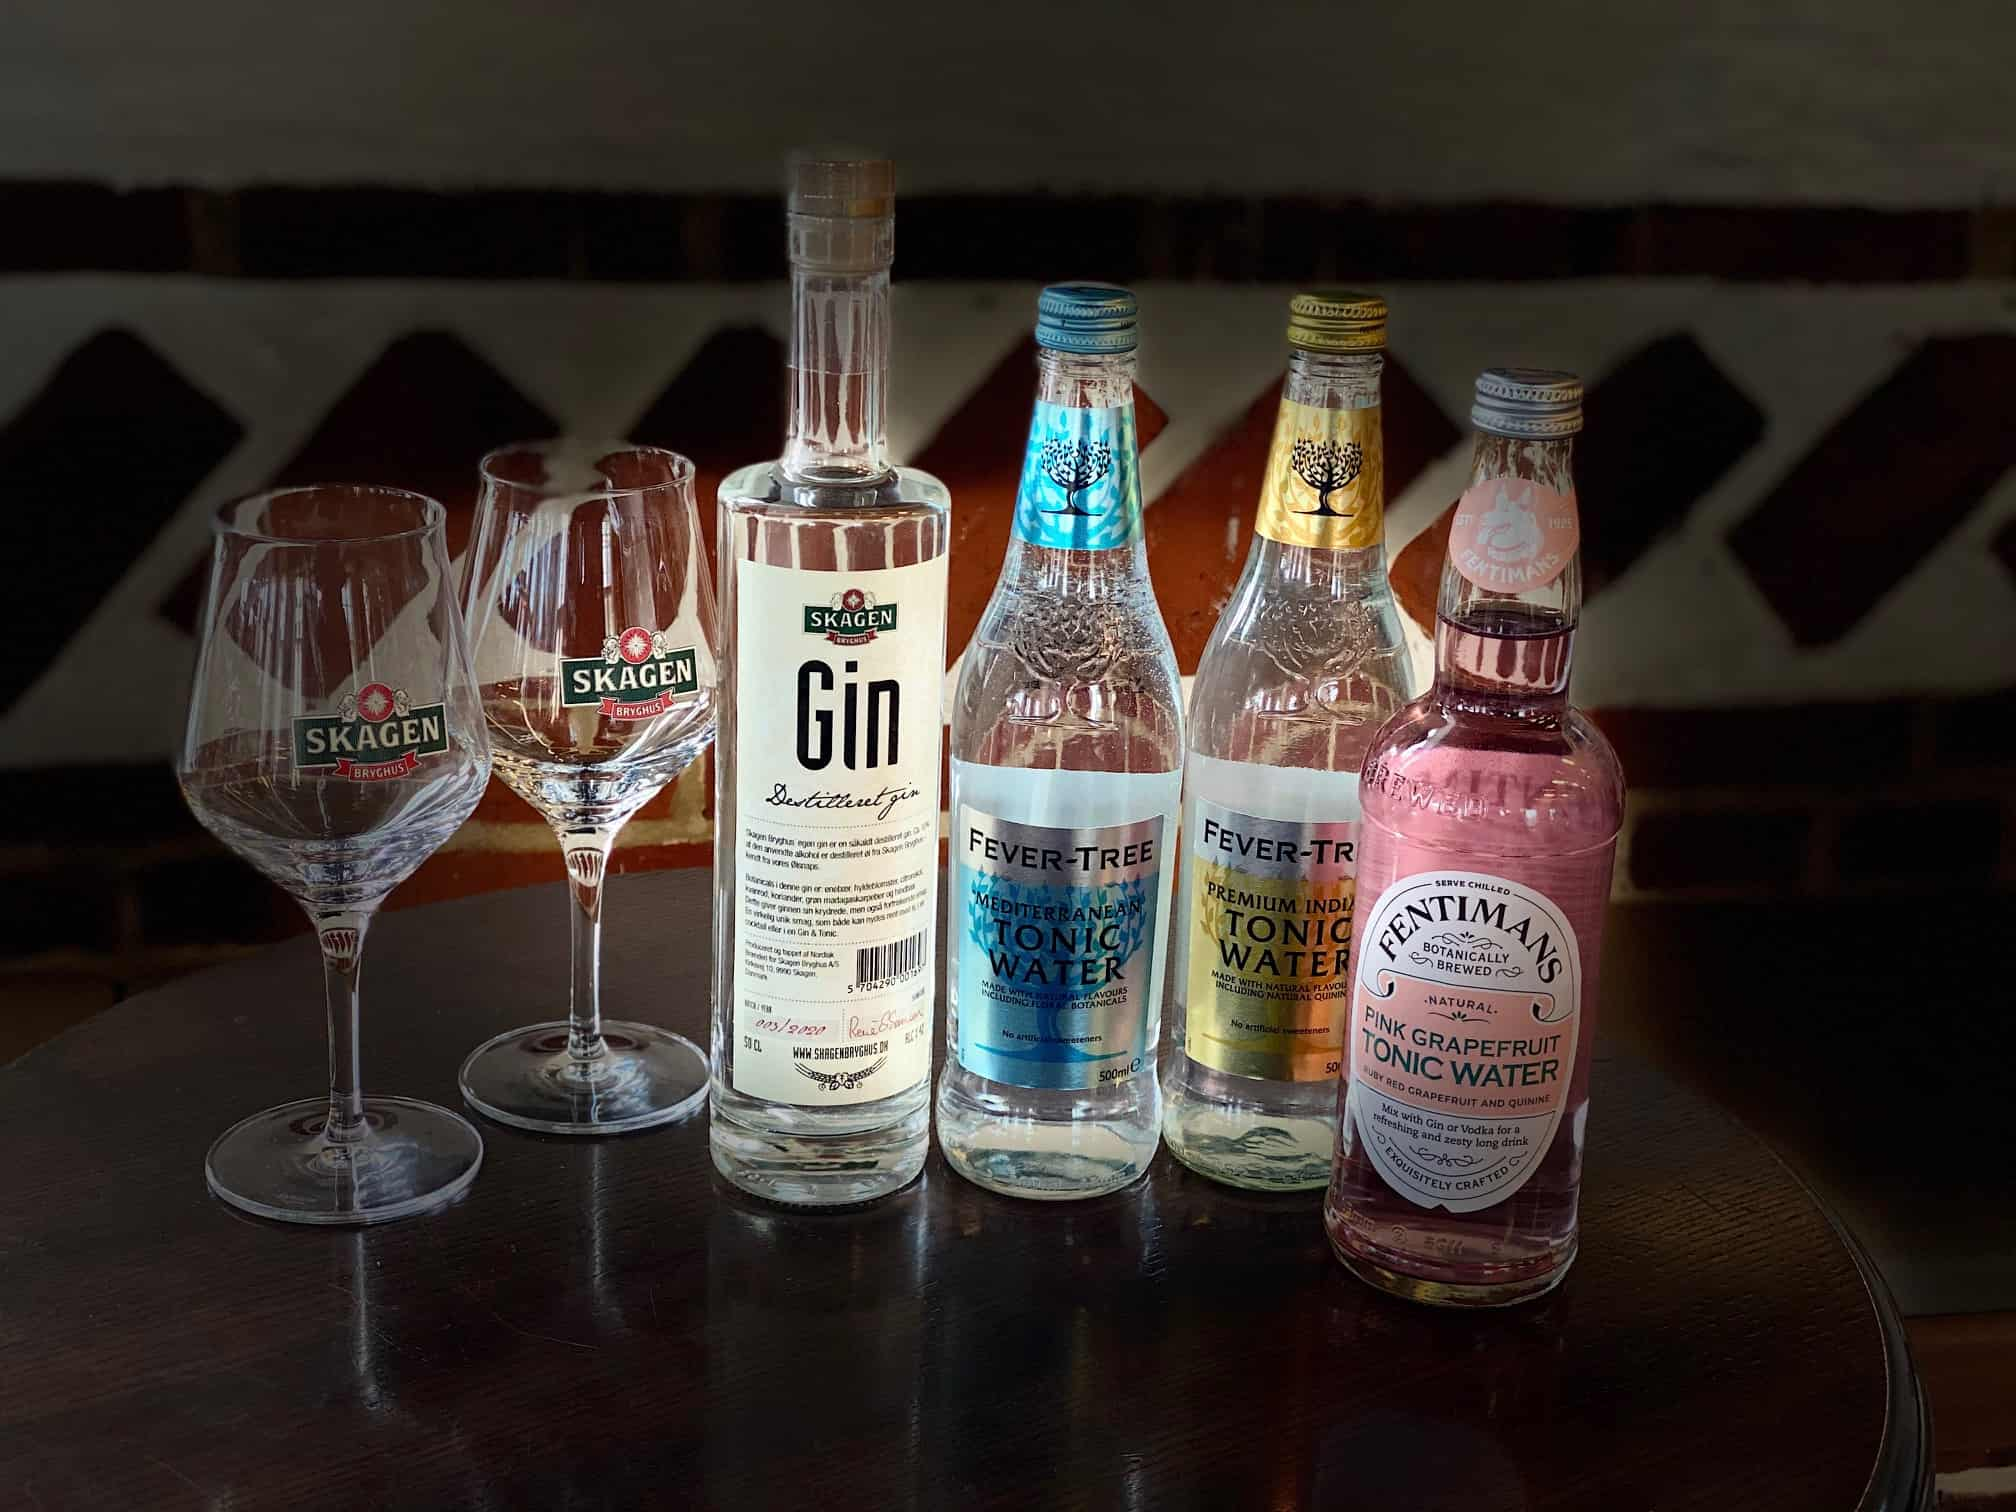 Gin & Tonic pakken